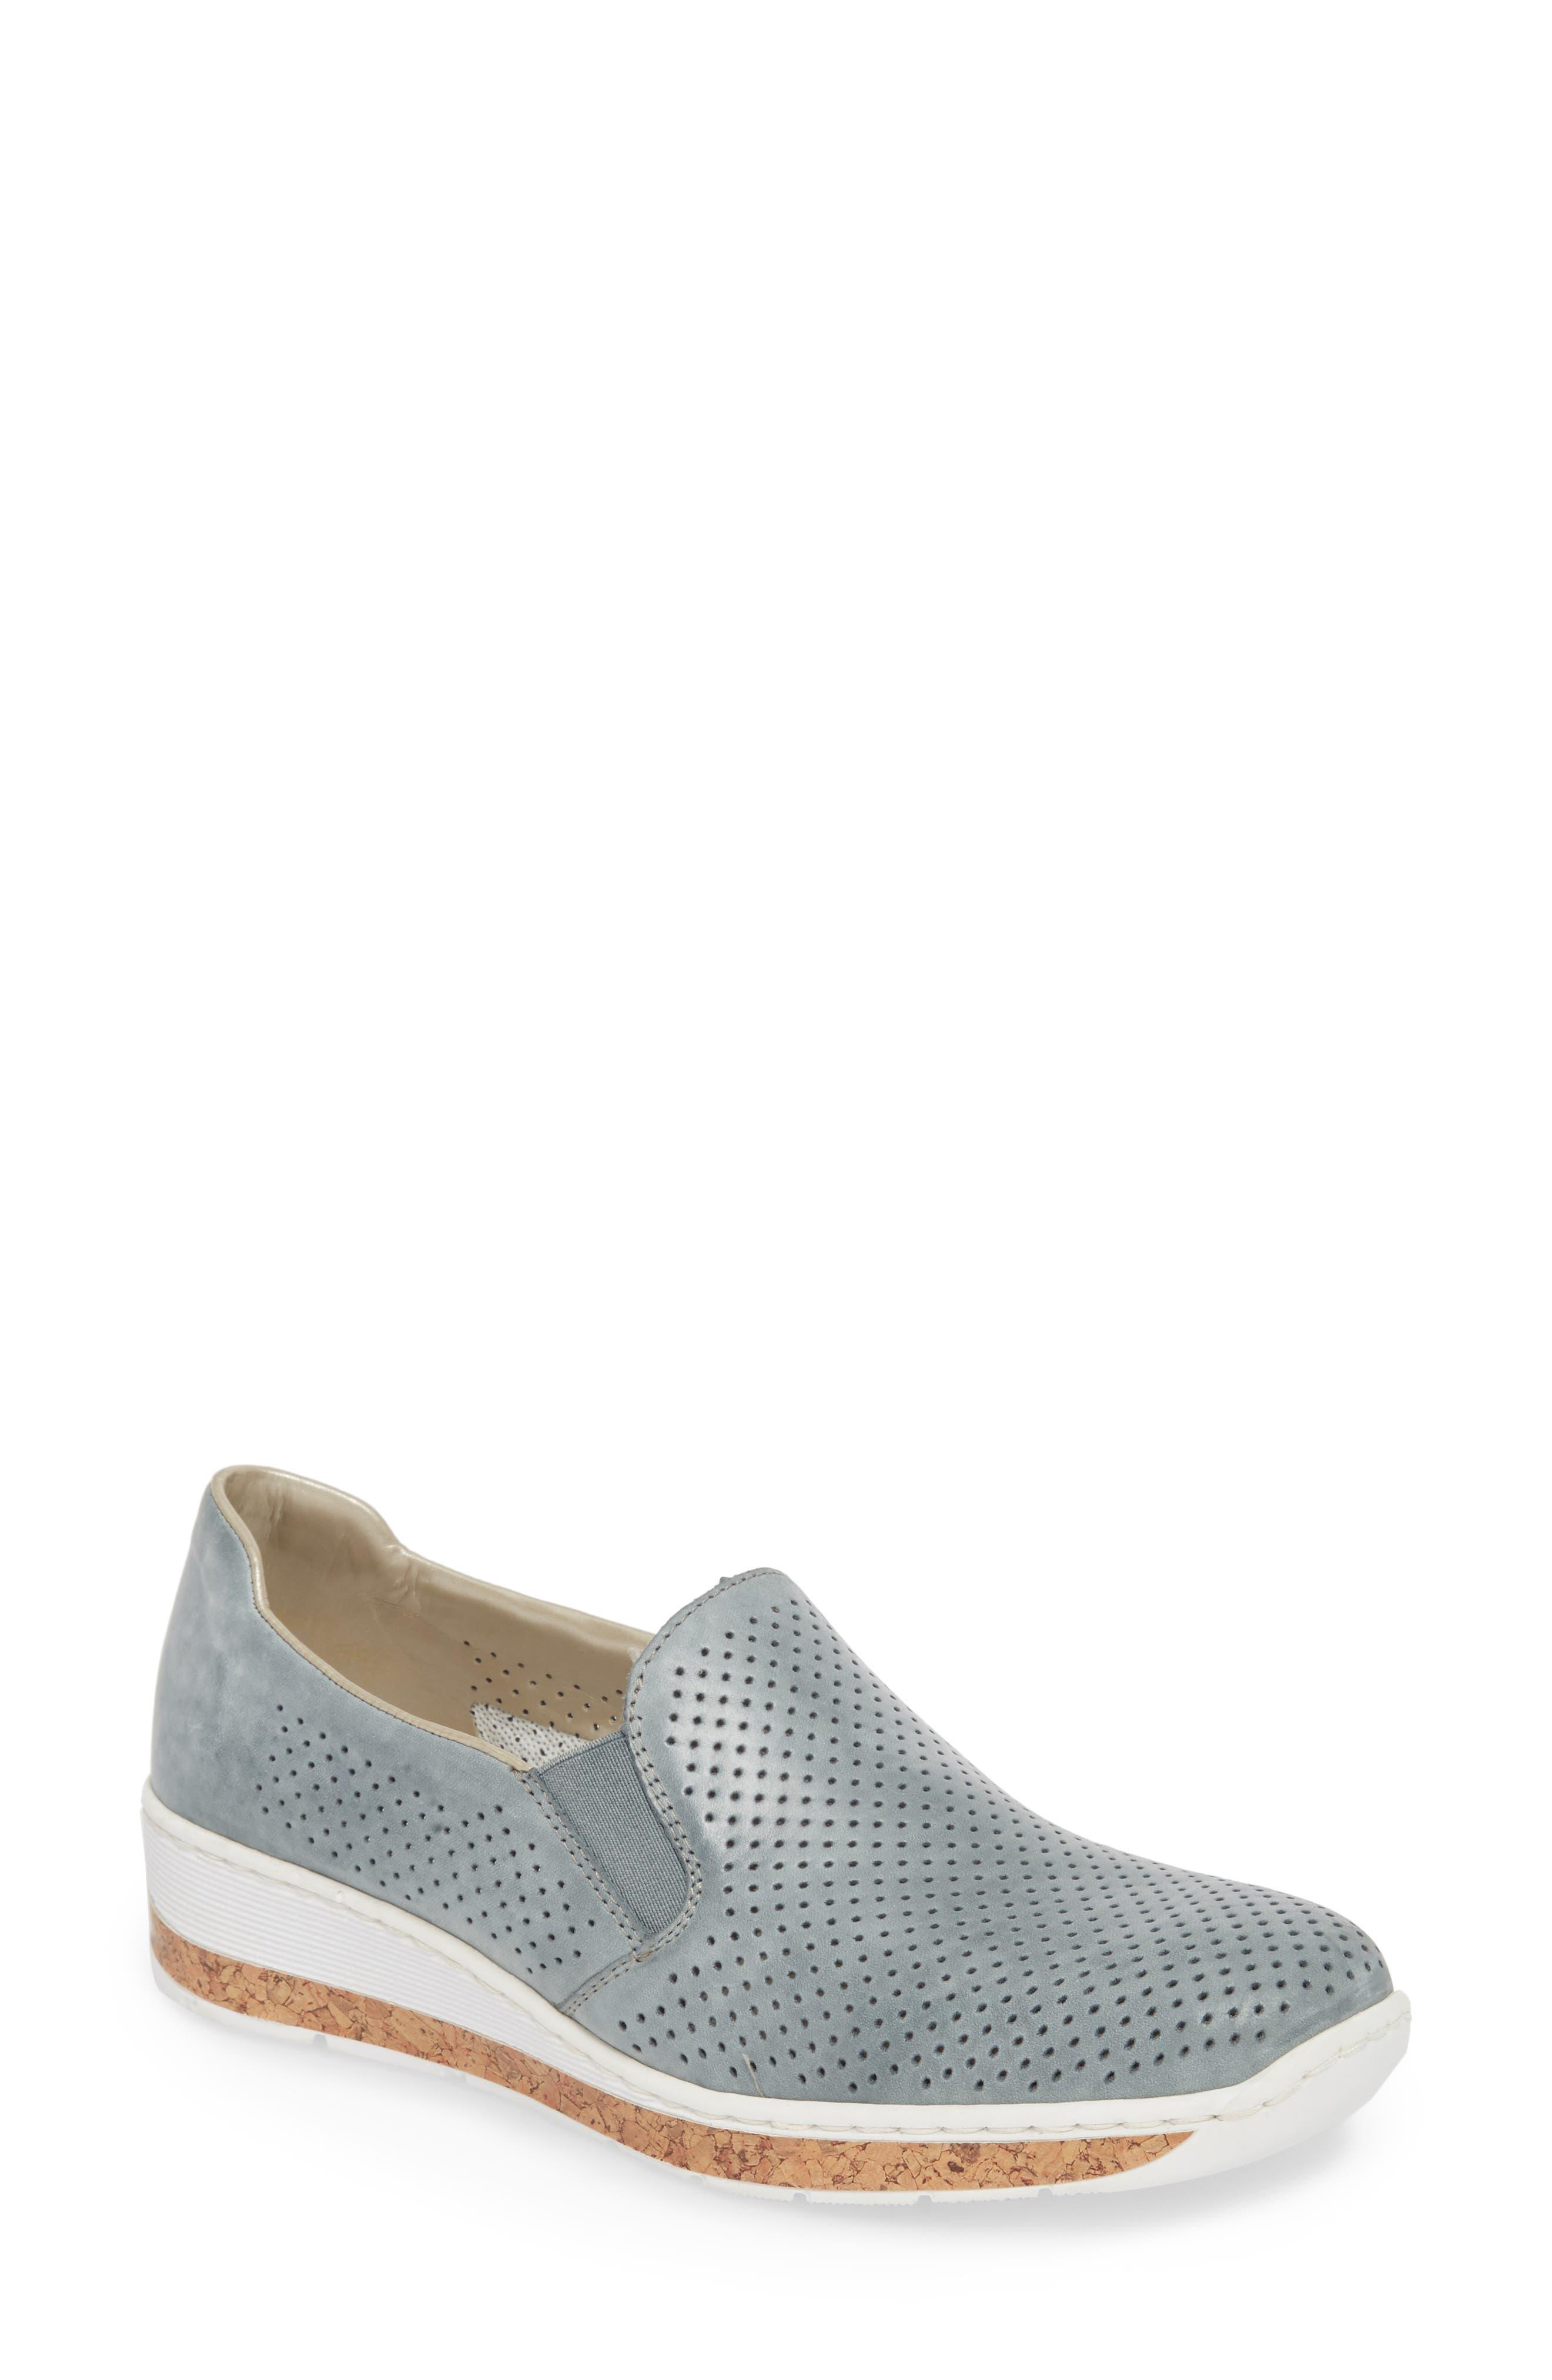 Rieker Antistress Doris 75 Wedge Sneaker (Women)